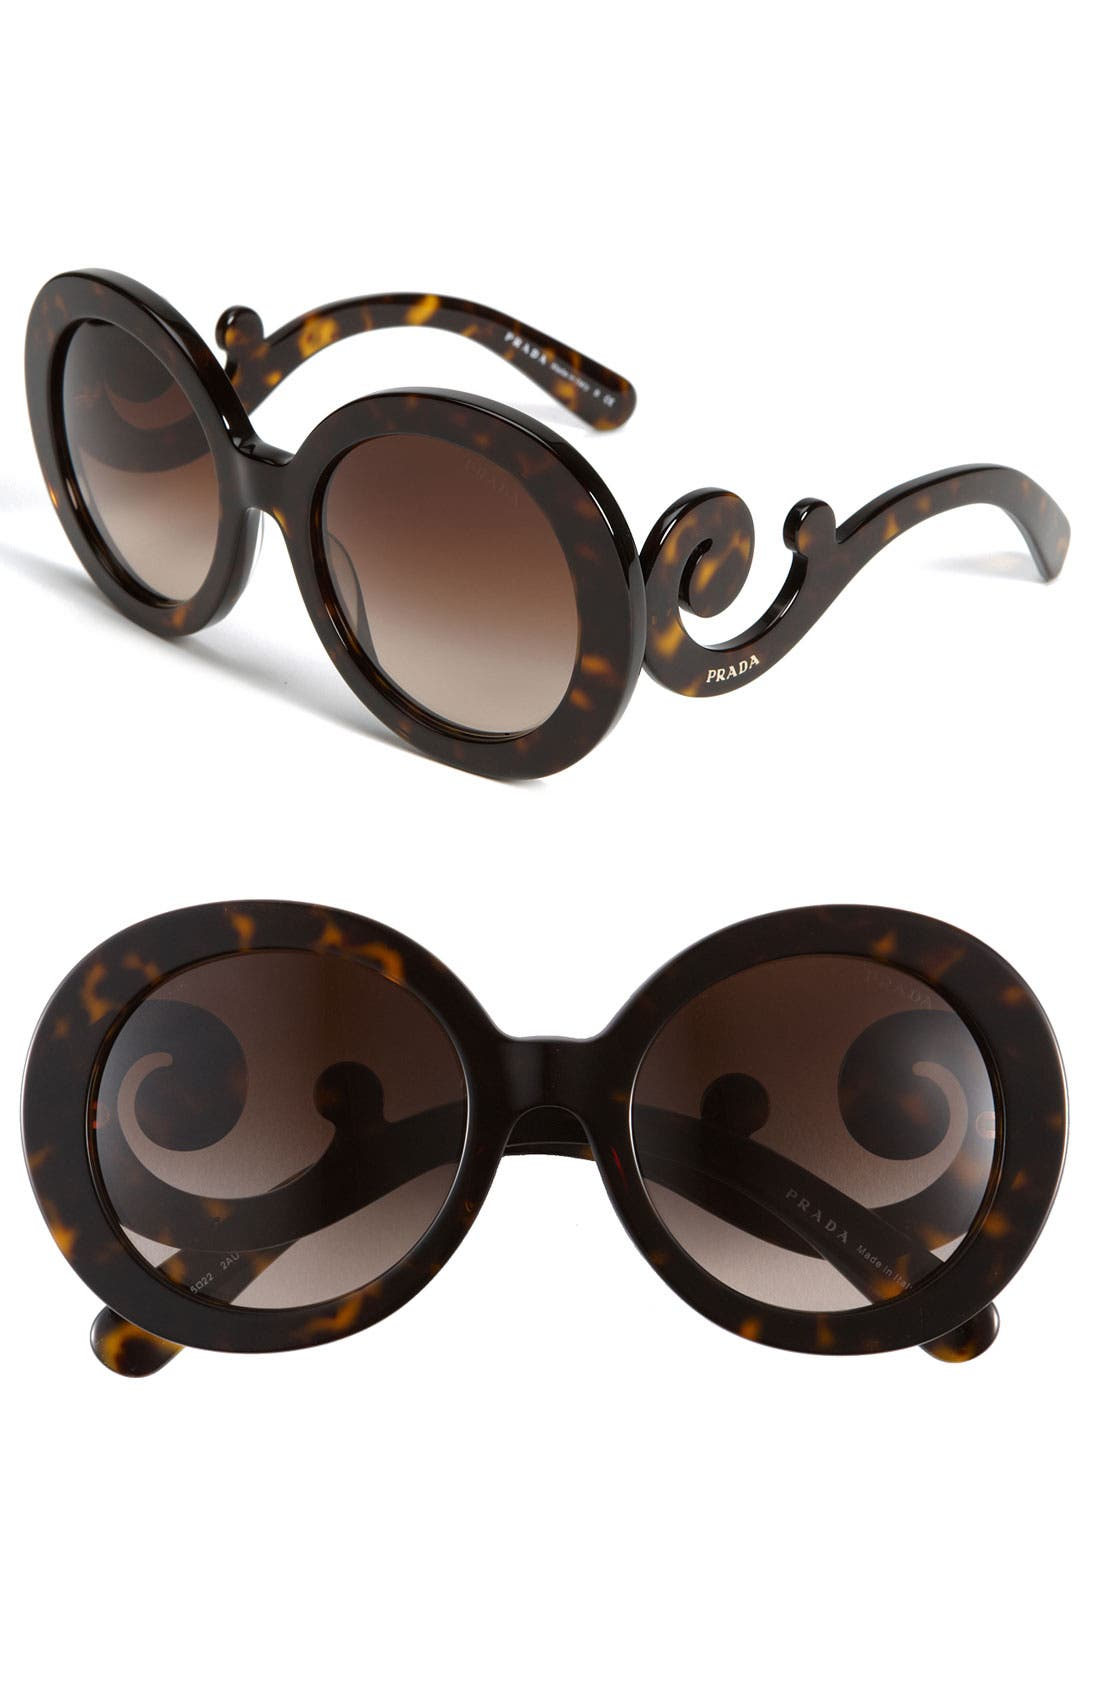 1dfc9f4f0ca ... clearance prada baroque 55mm round sunglasses nordstrom 31726 b63f6